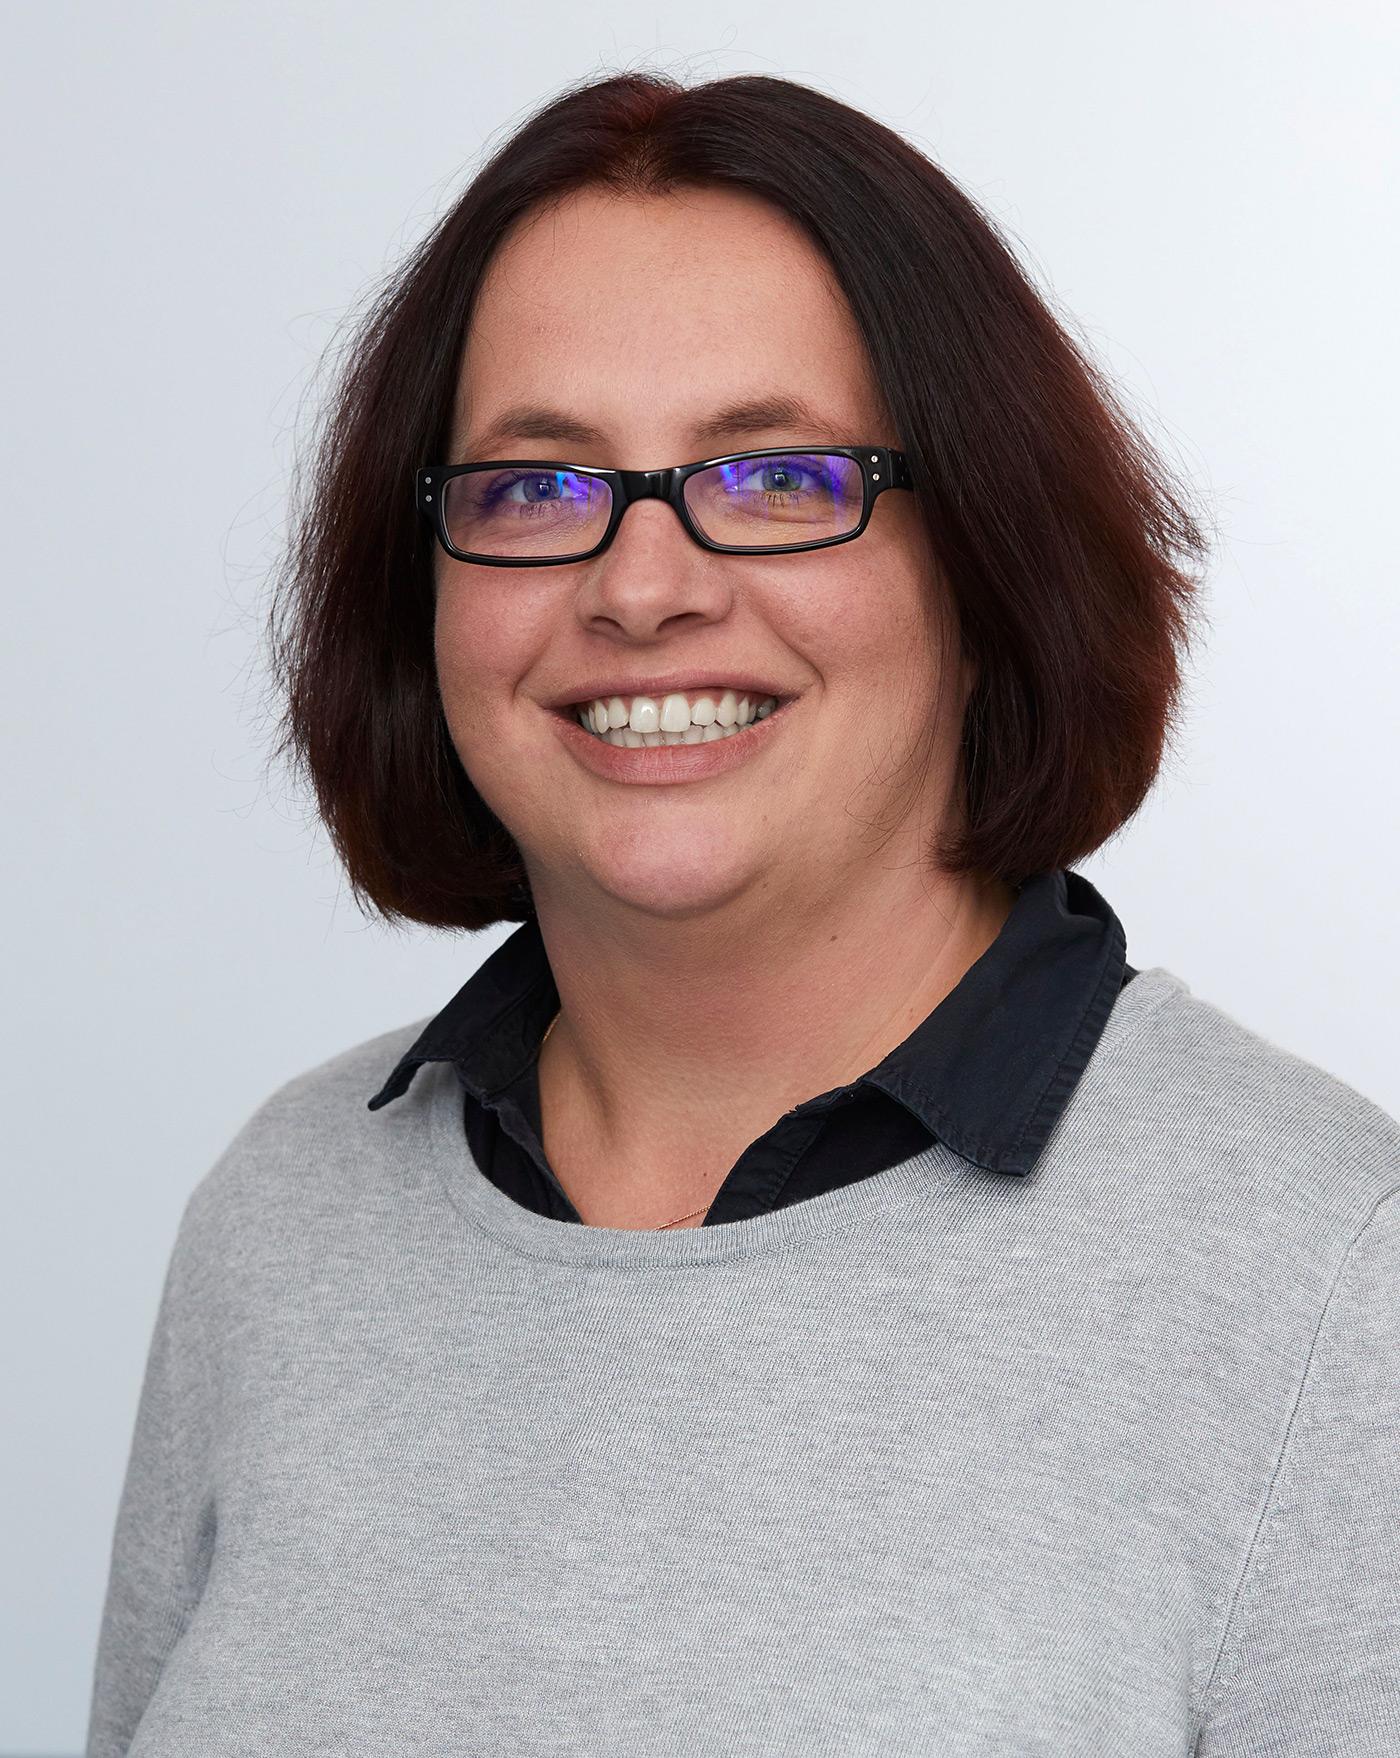 Evelina Jungaityte